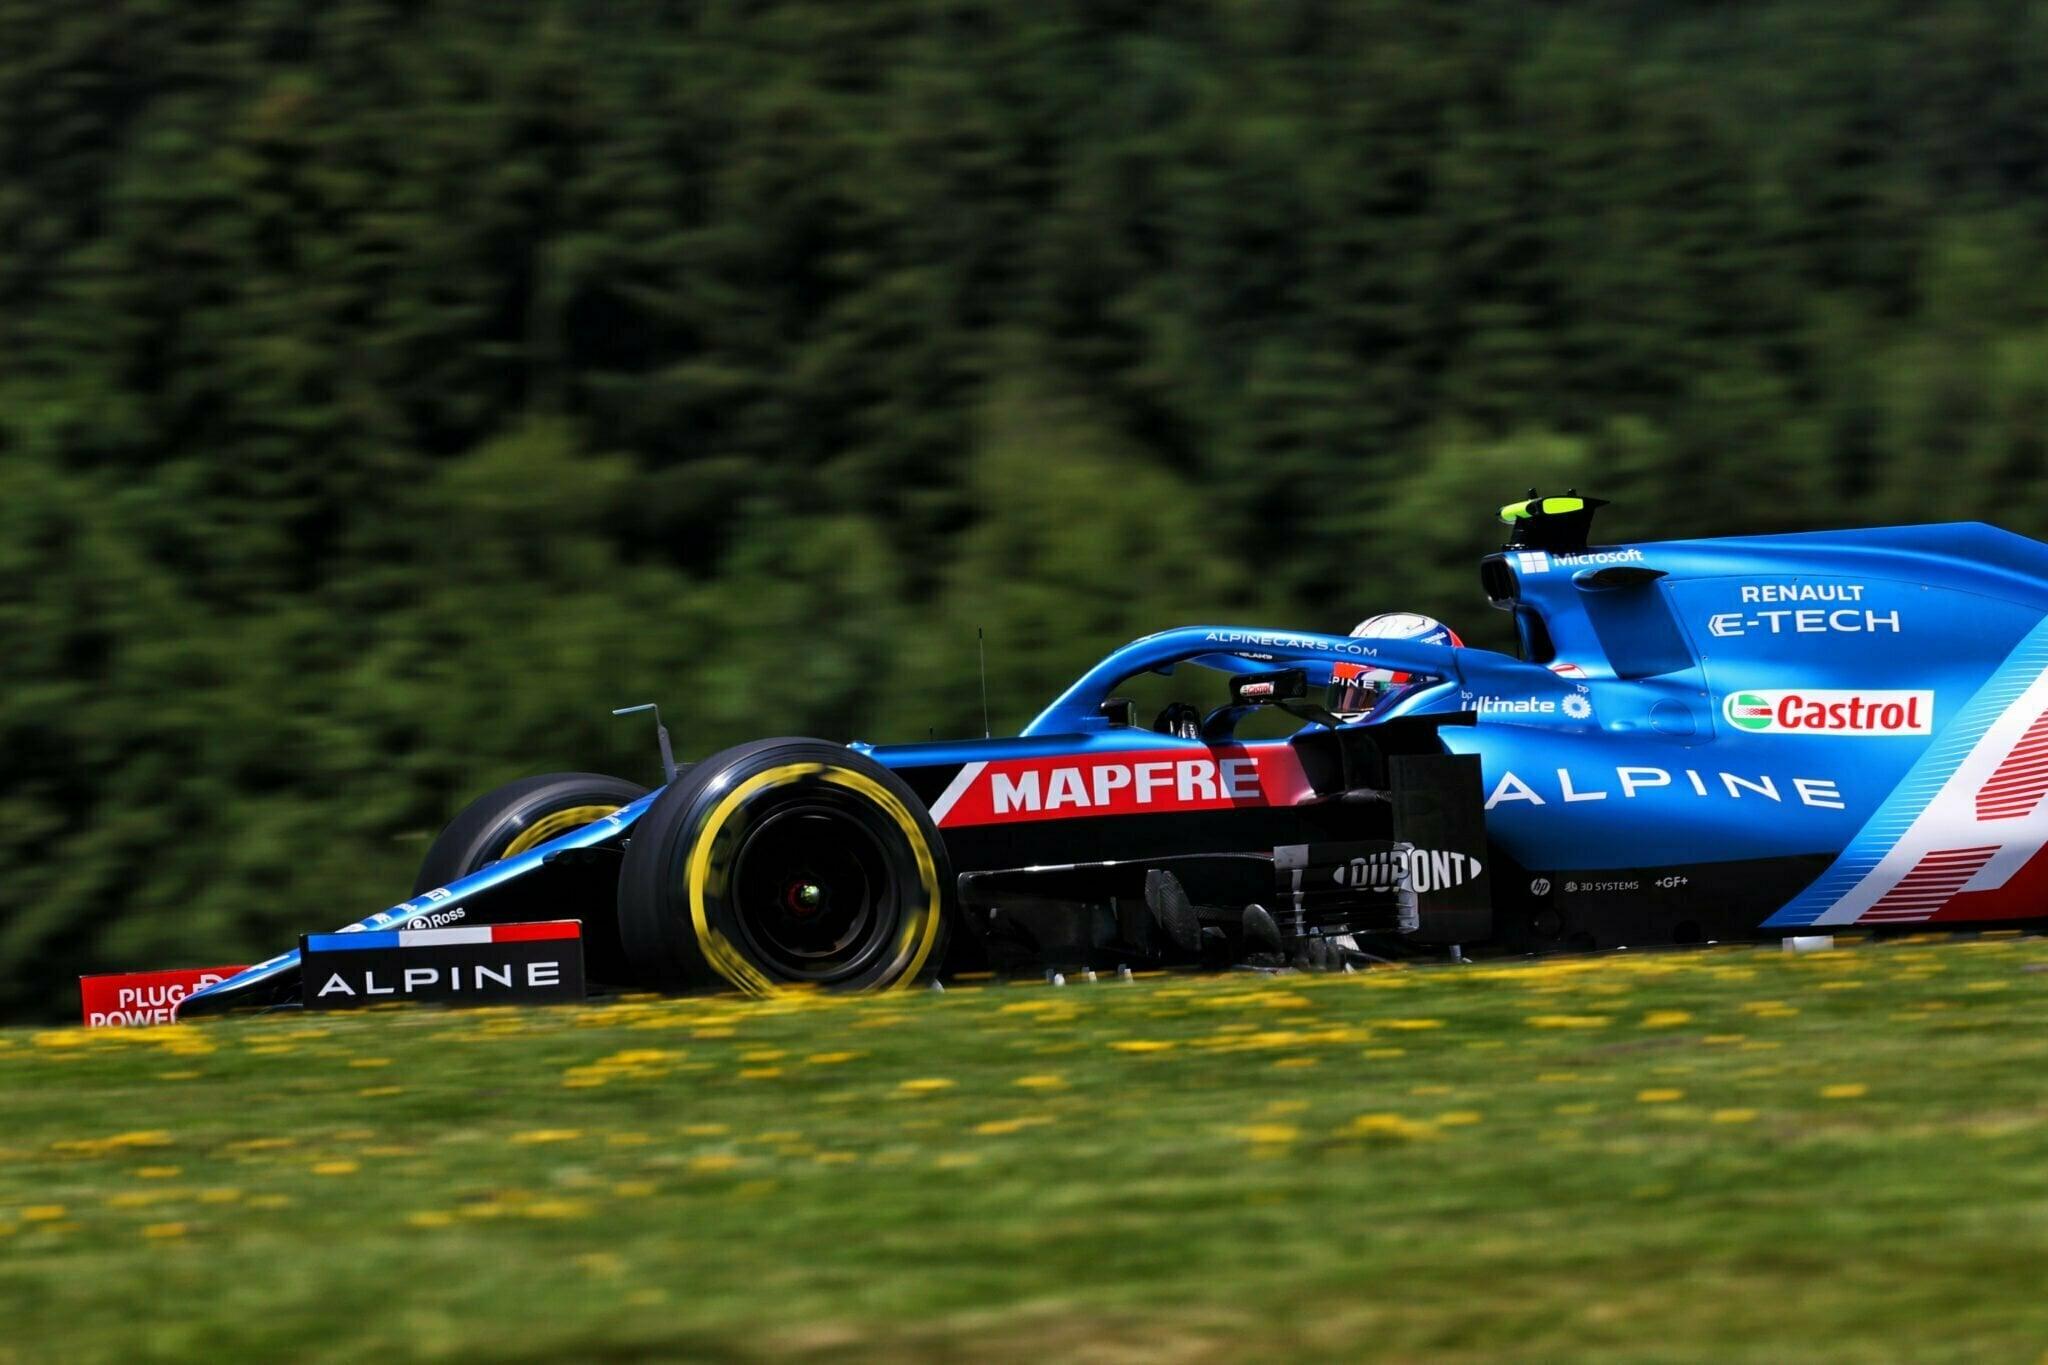 Alpine F1 Team Alonso Ocon Autriche Steiermark Grand Prix Spielberg A521 2021 41 | Alpine F1 : Alonso rapporte deux points au Grand Prix BWT de Styrie